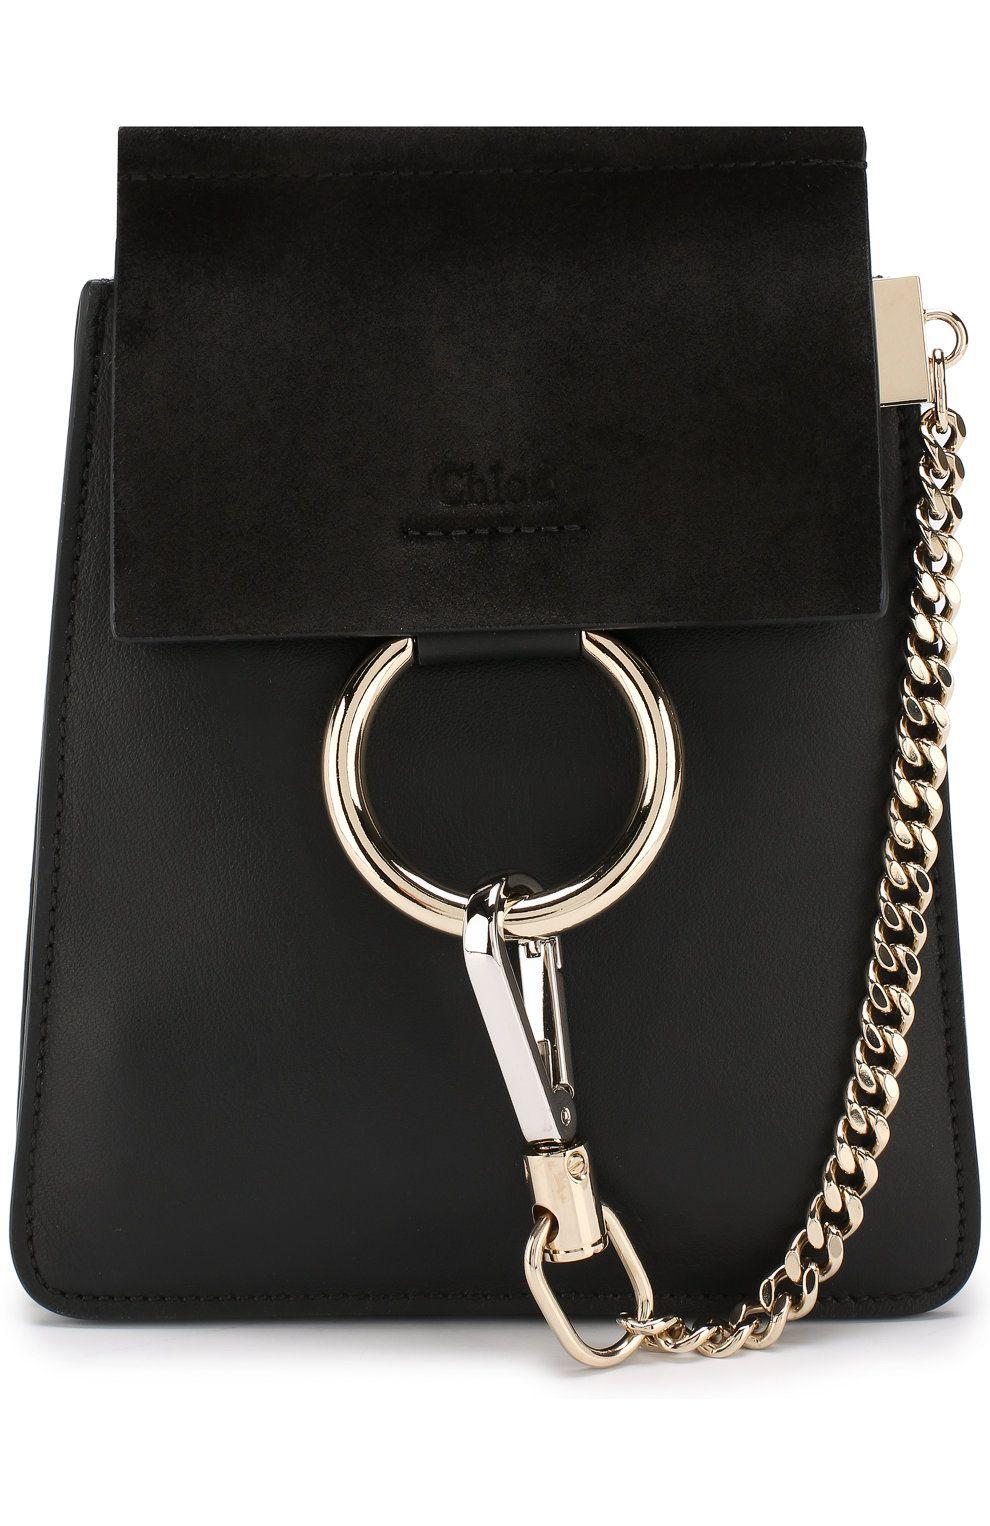 0947d4be4c06 Женская сумка faye small bracelet CHLOÉ черного цвета, сезон FW 18/19, арт